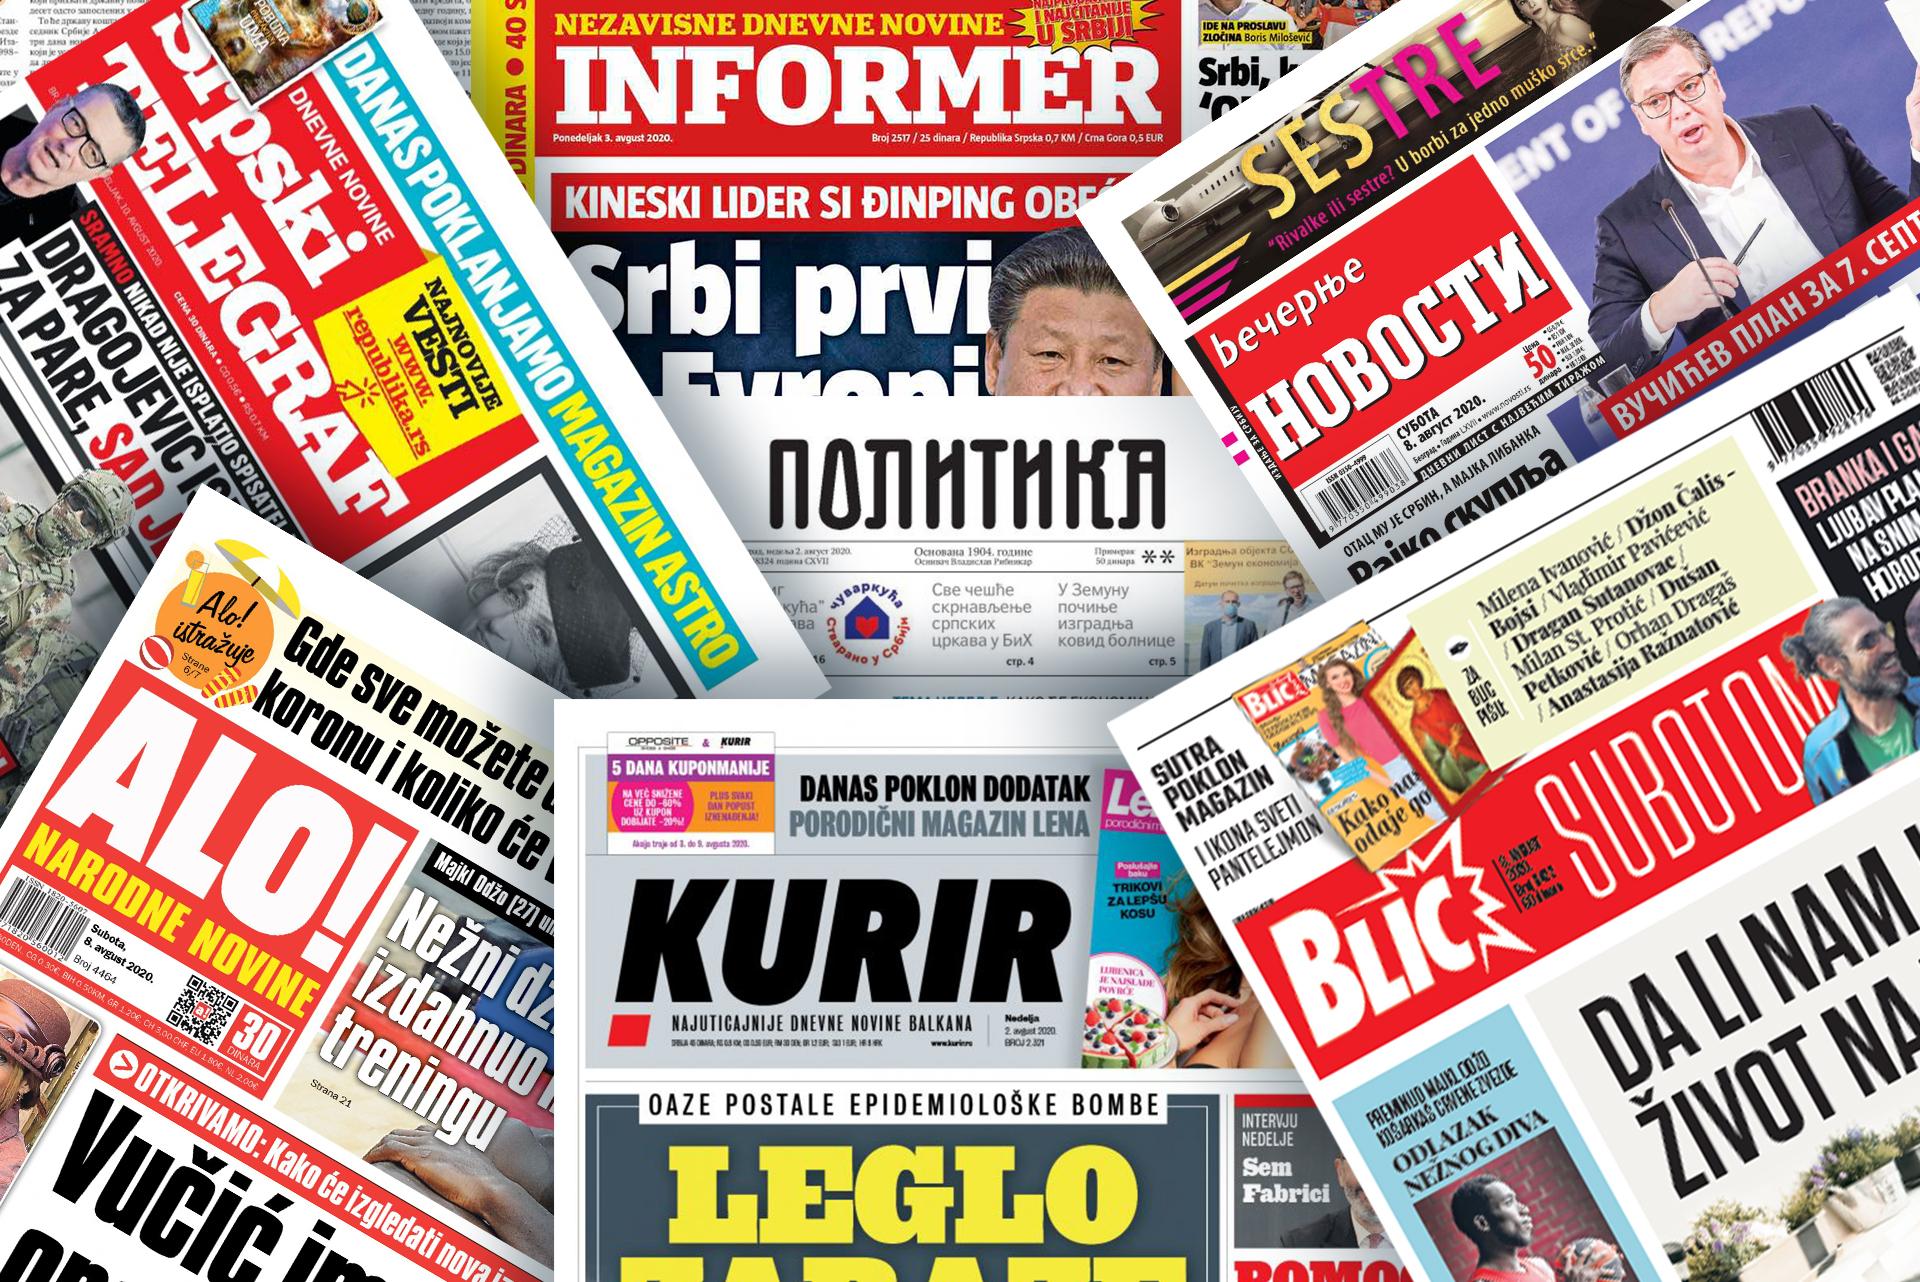 Naslovne strane novina